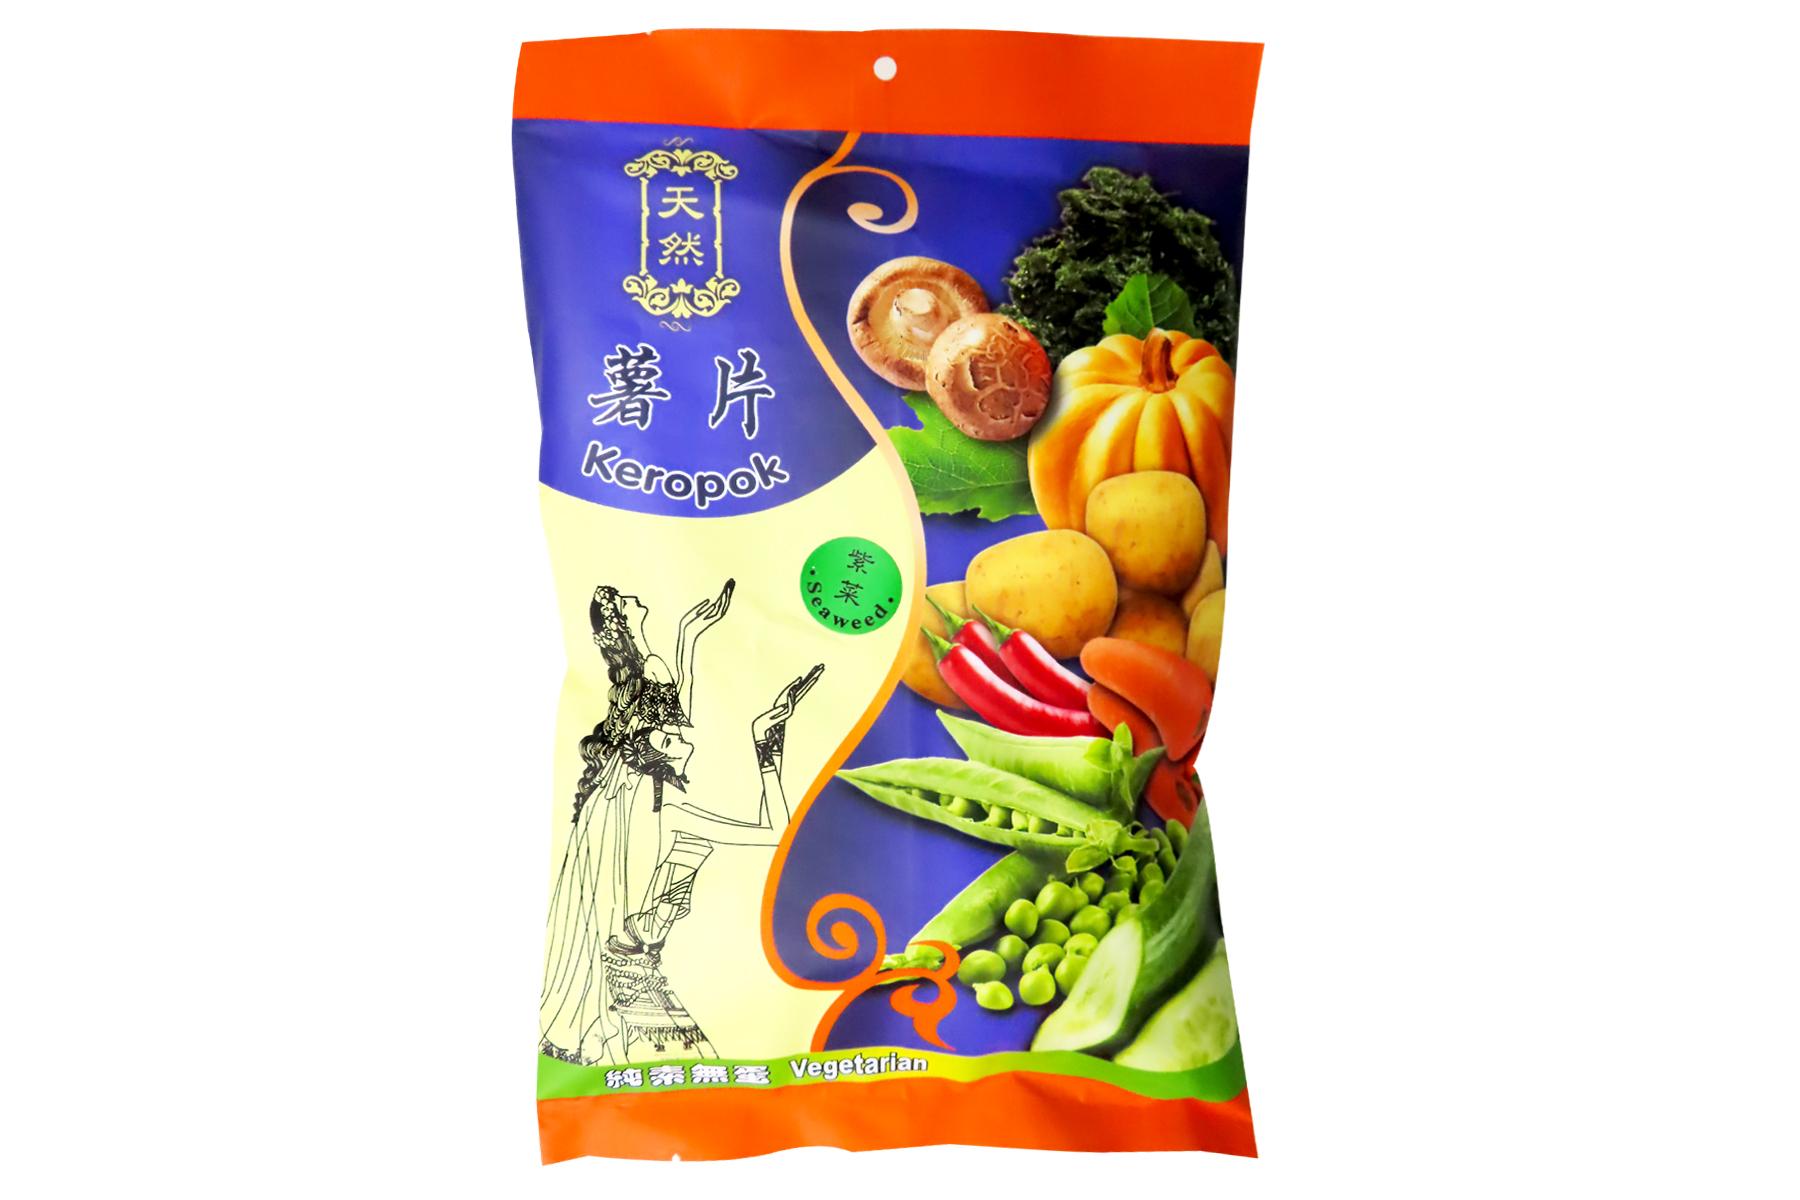 Image Kun Yi Seaweed Cracker 昆益 - 紫菜薯片 40grams